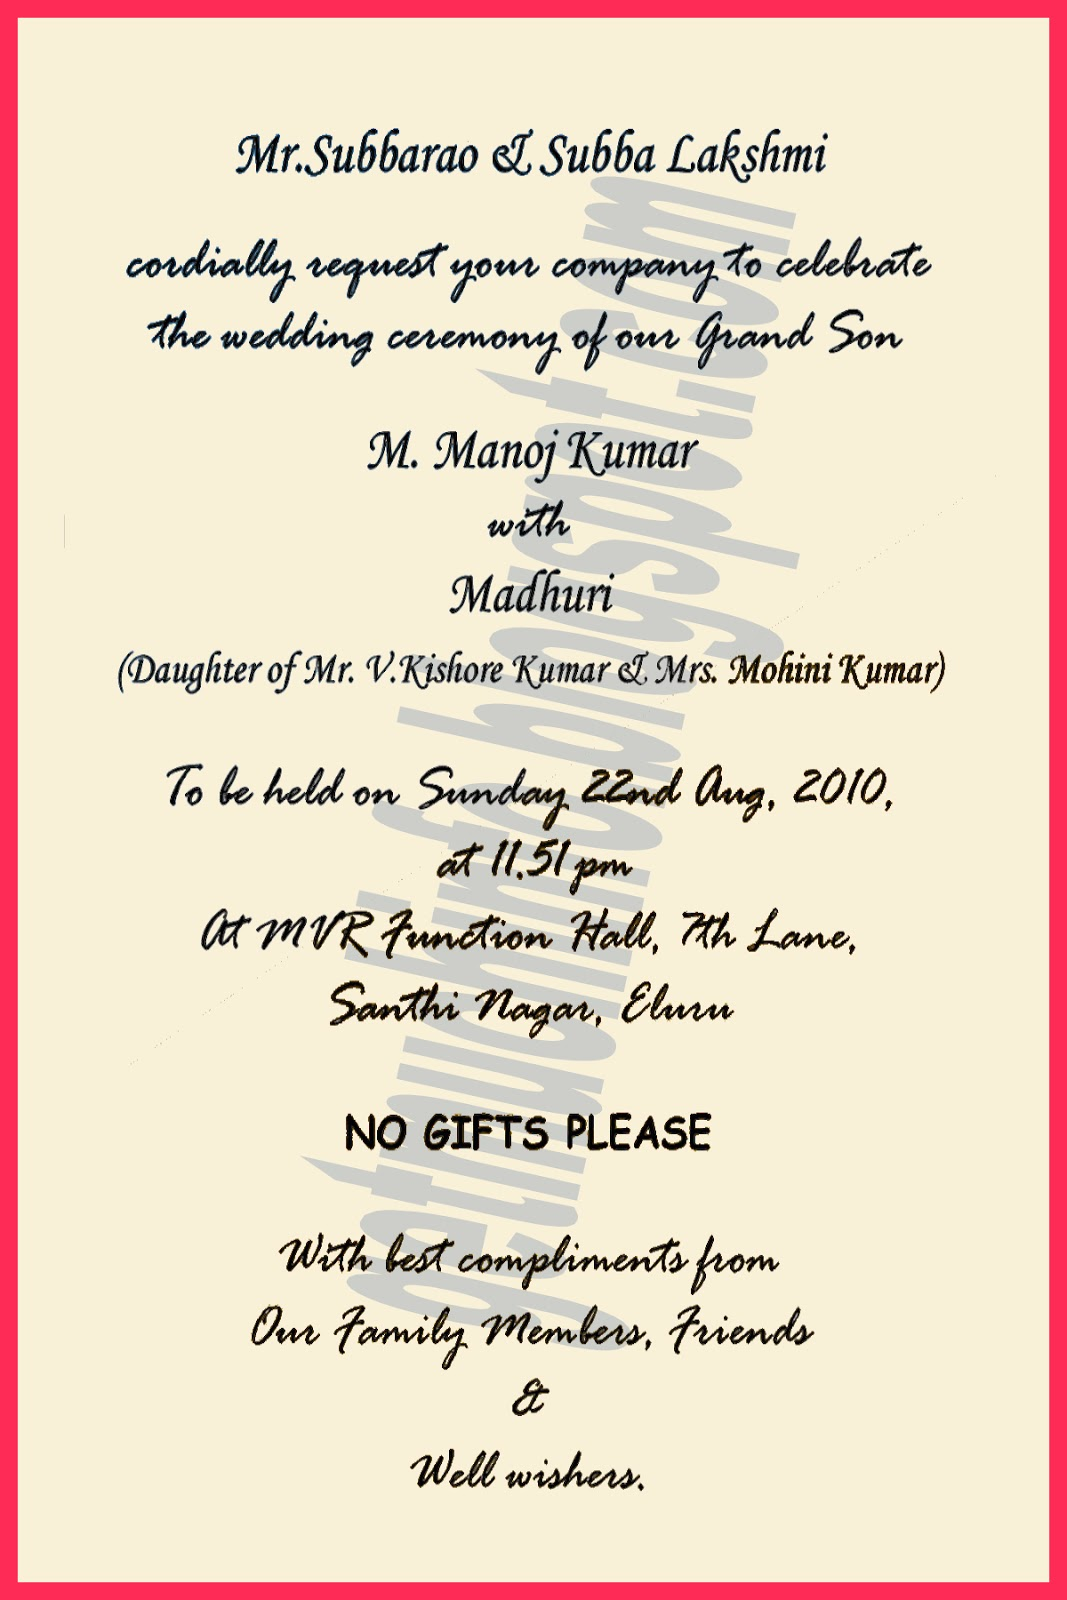 Wedding Invitation In English Matter Gallery Party Invitations Ideas